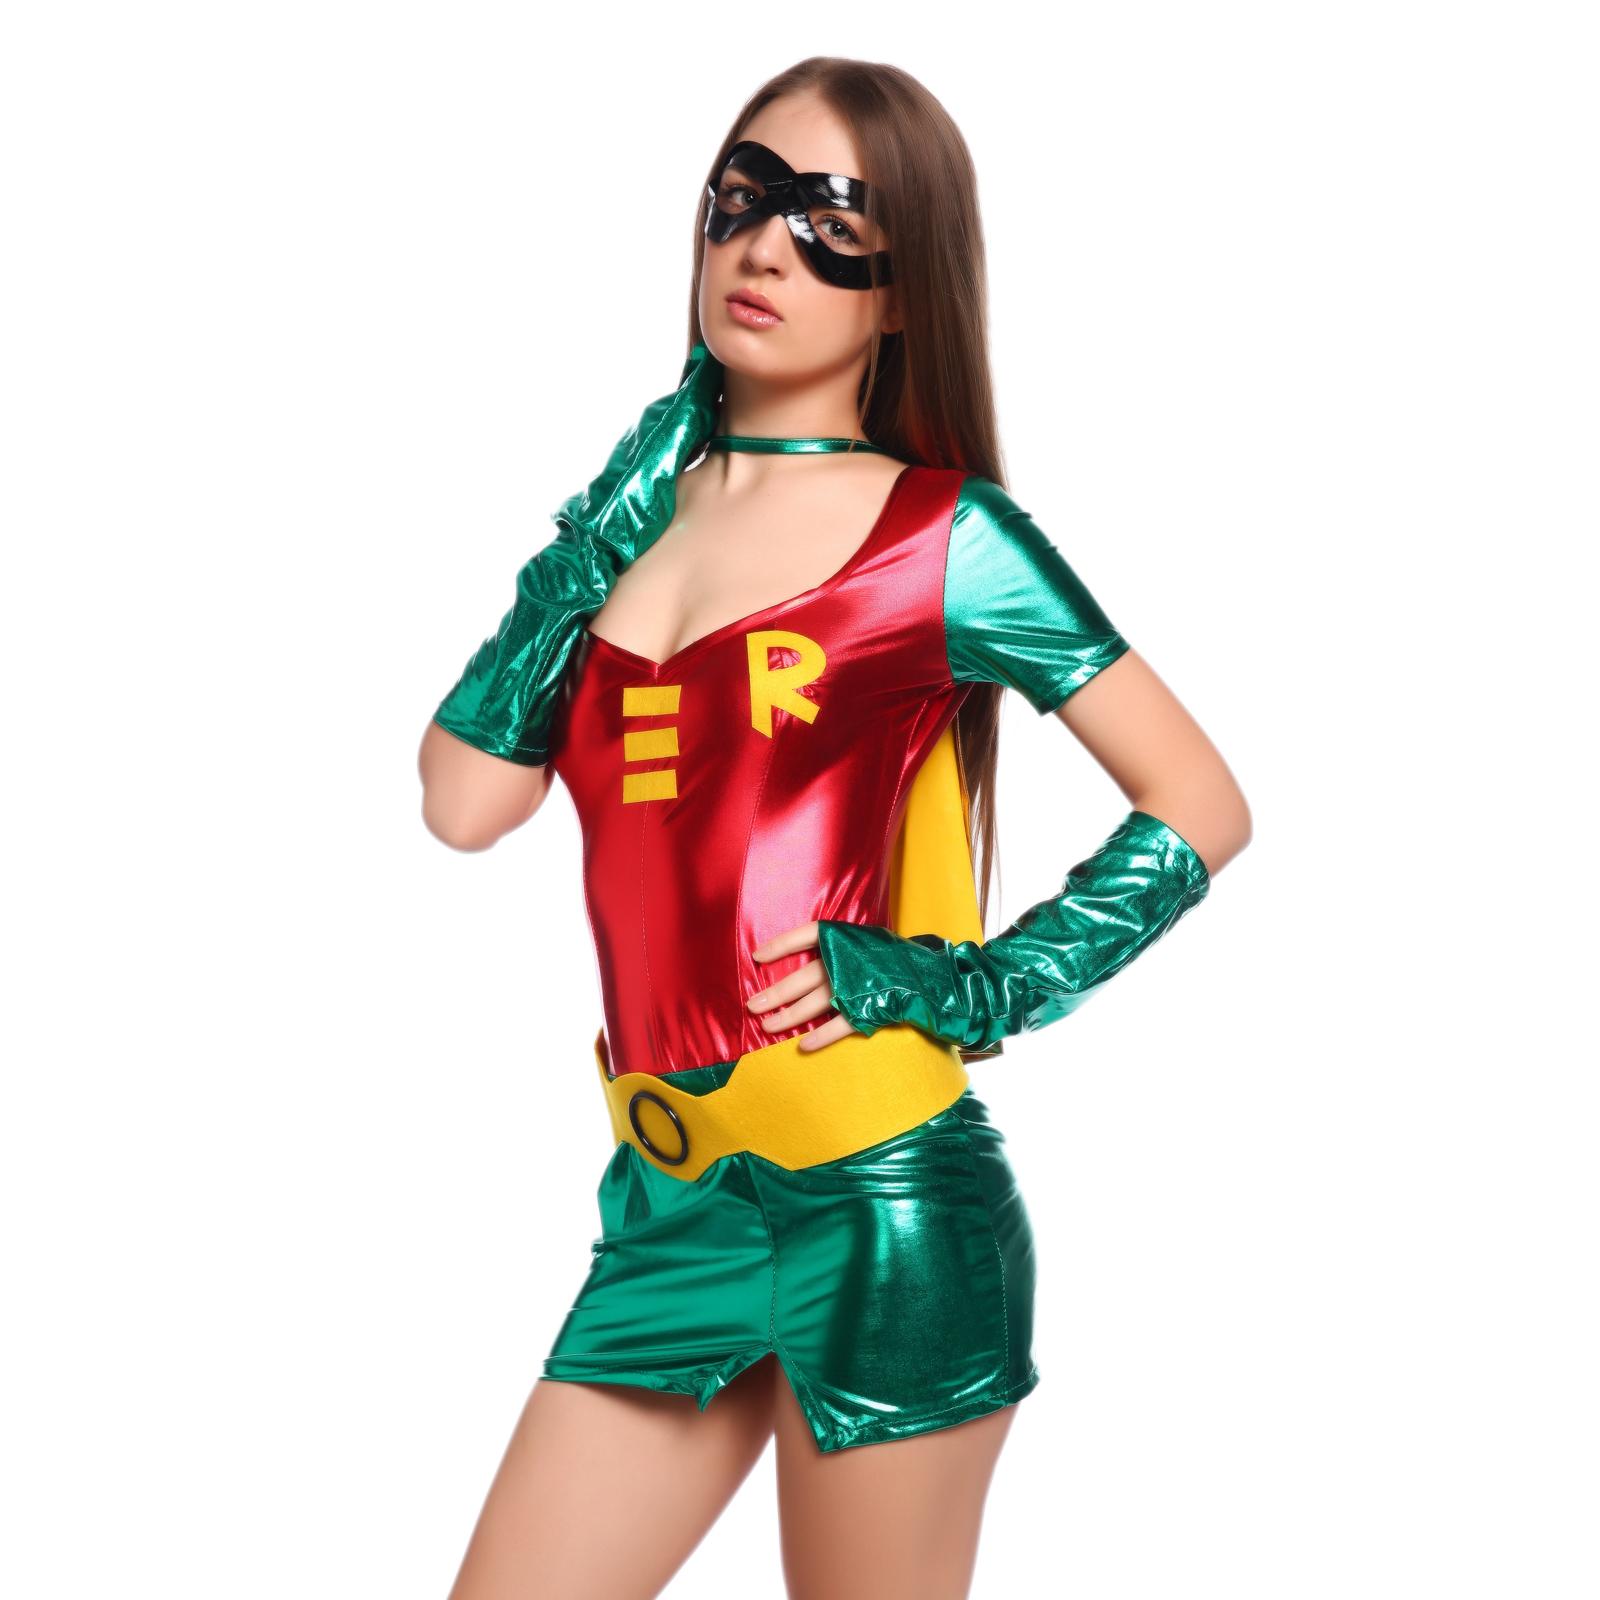 Cotume-Deguisement-Sexy-Robin-Heroine-Superhero-Femme-Halloween-Carnaval-S-M-L